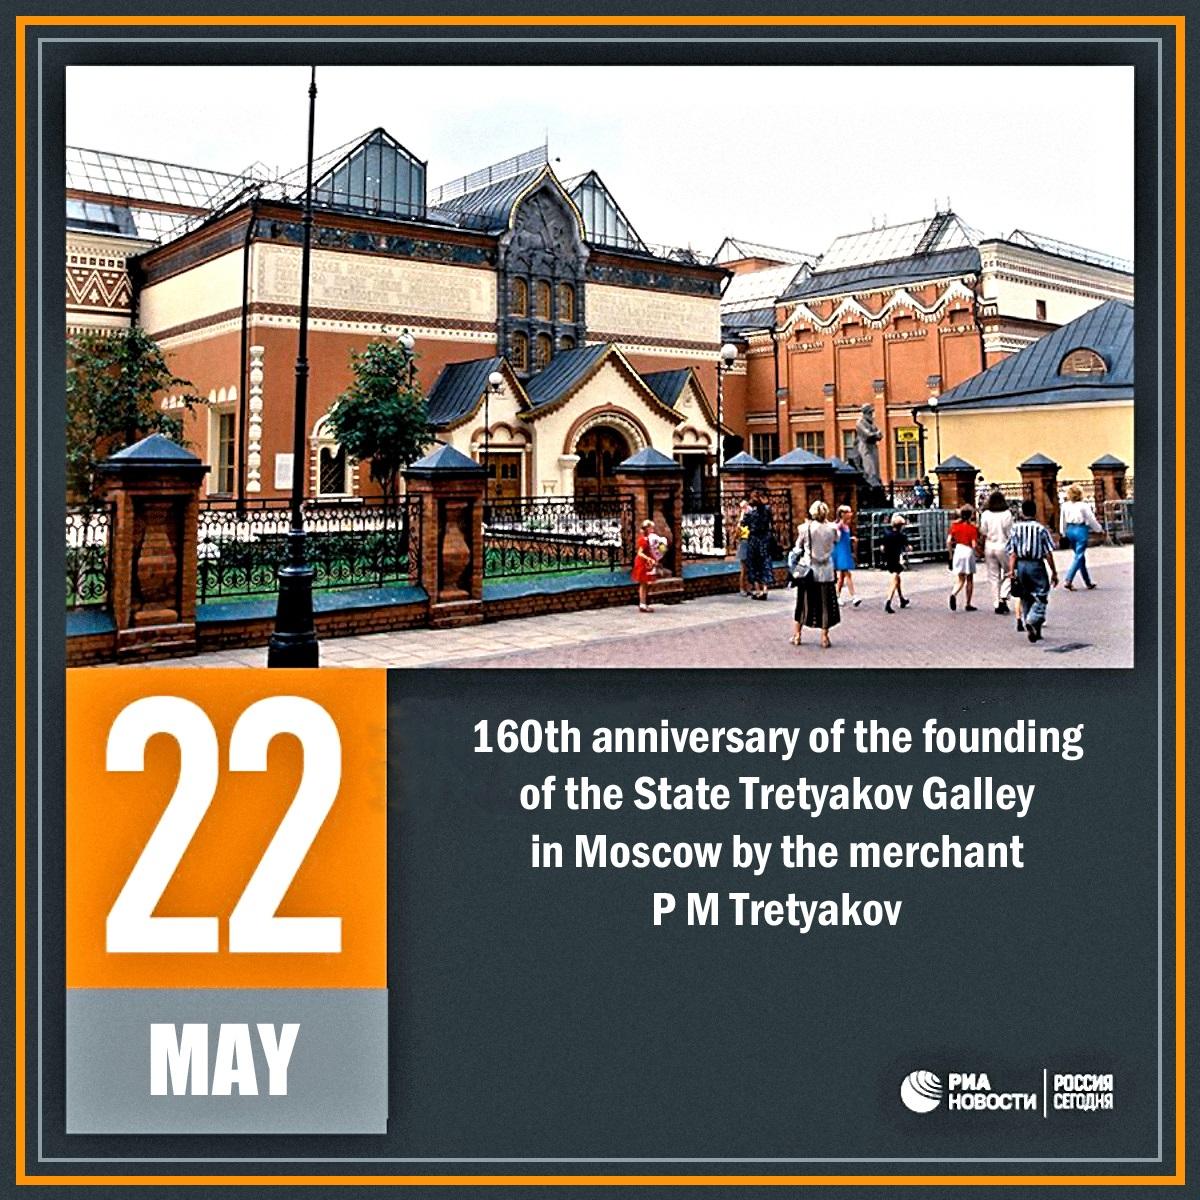 00 tretyakov gallery moscow anniversary 220516